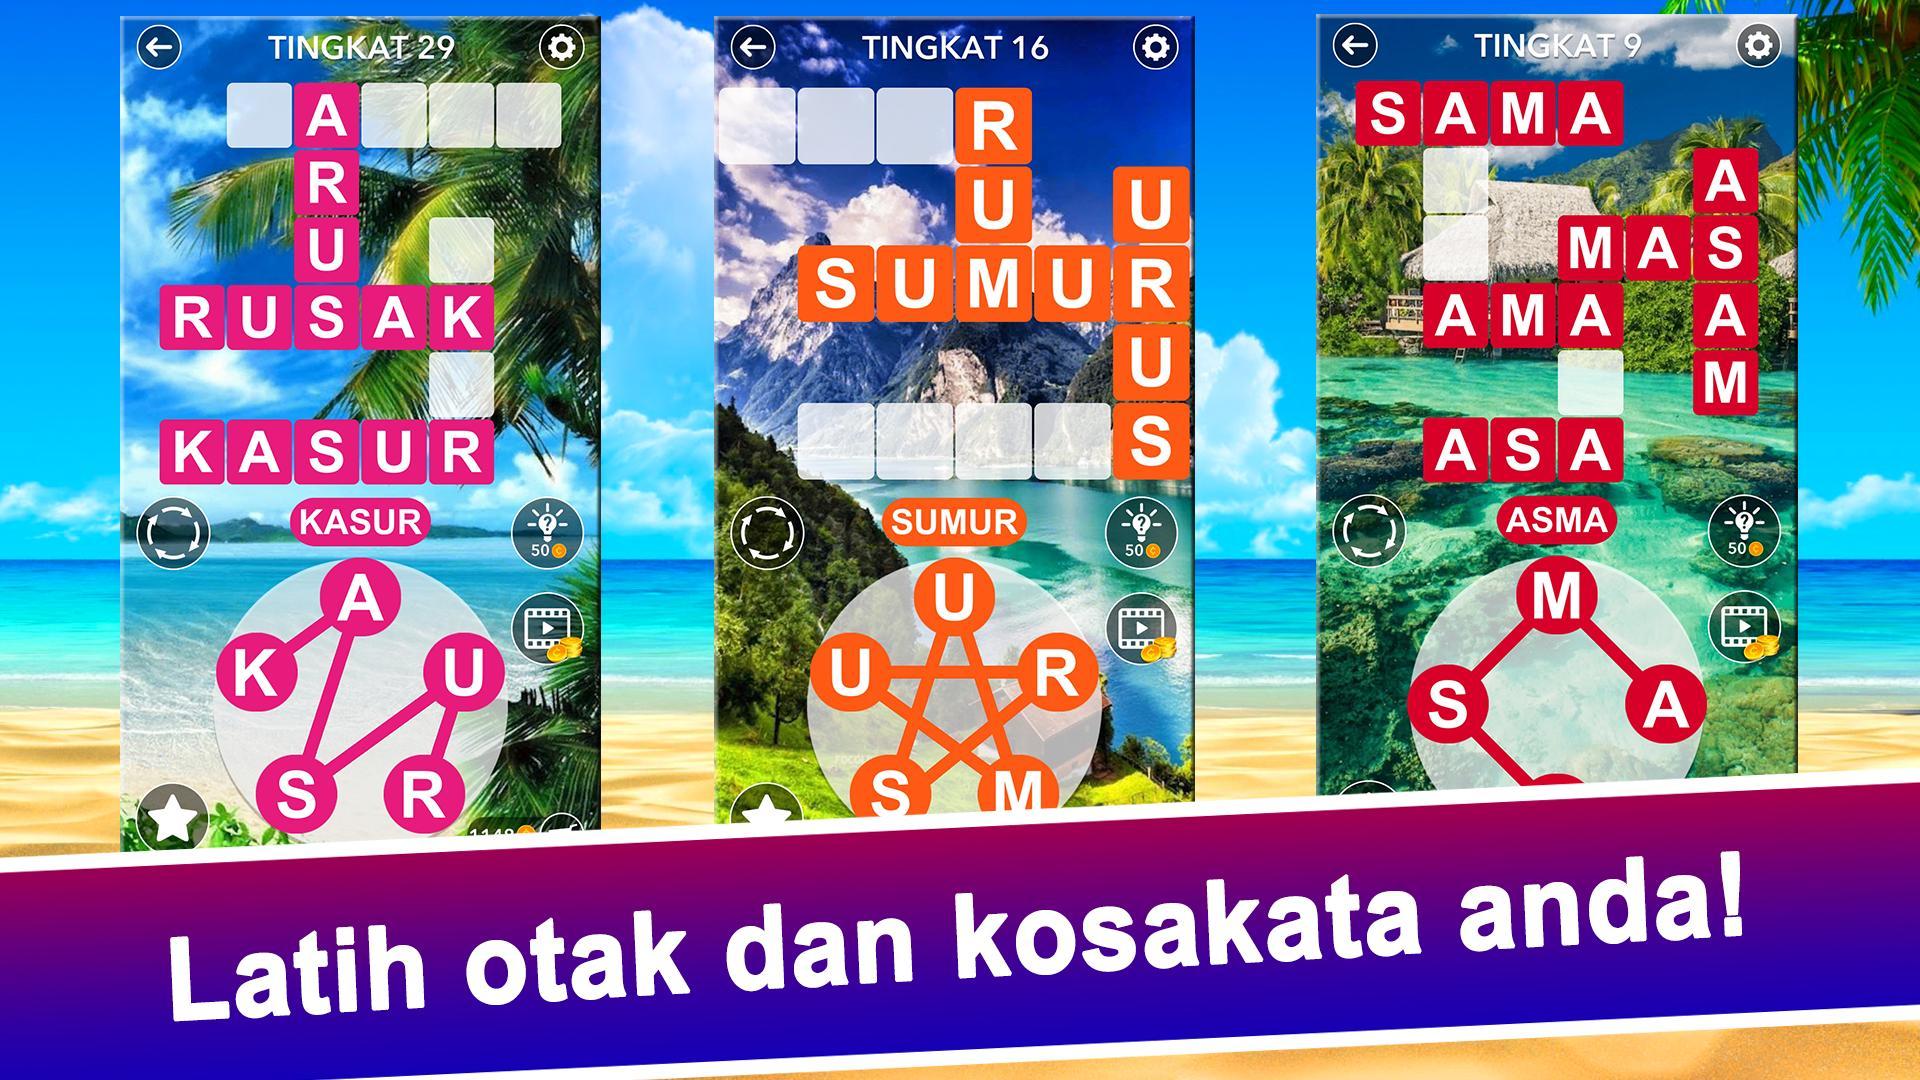 Kata Lintas Pencarian Teka Teki Silang Indonesia For Android Apk Download